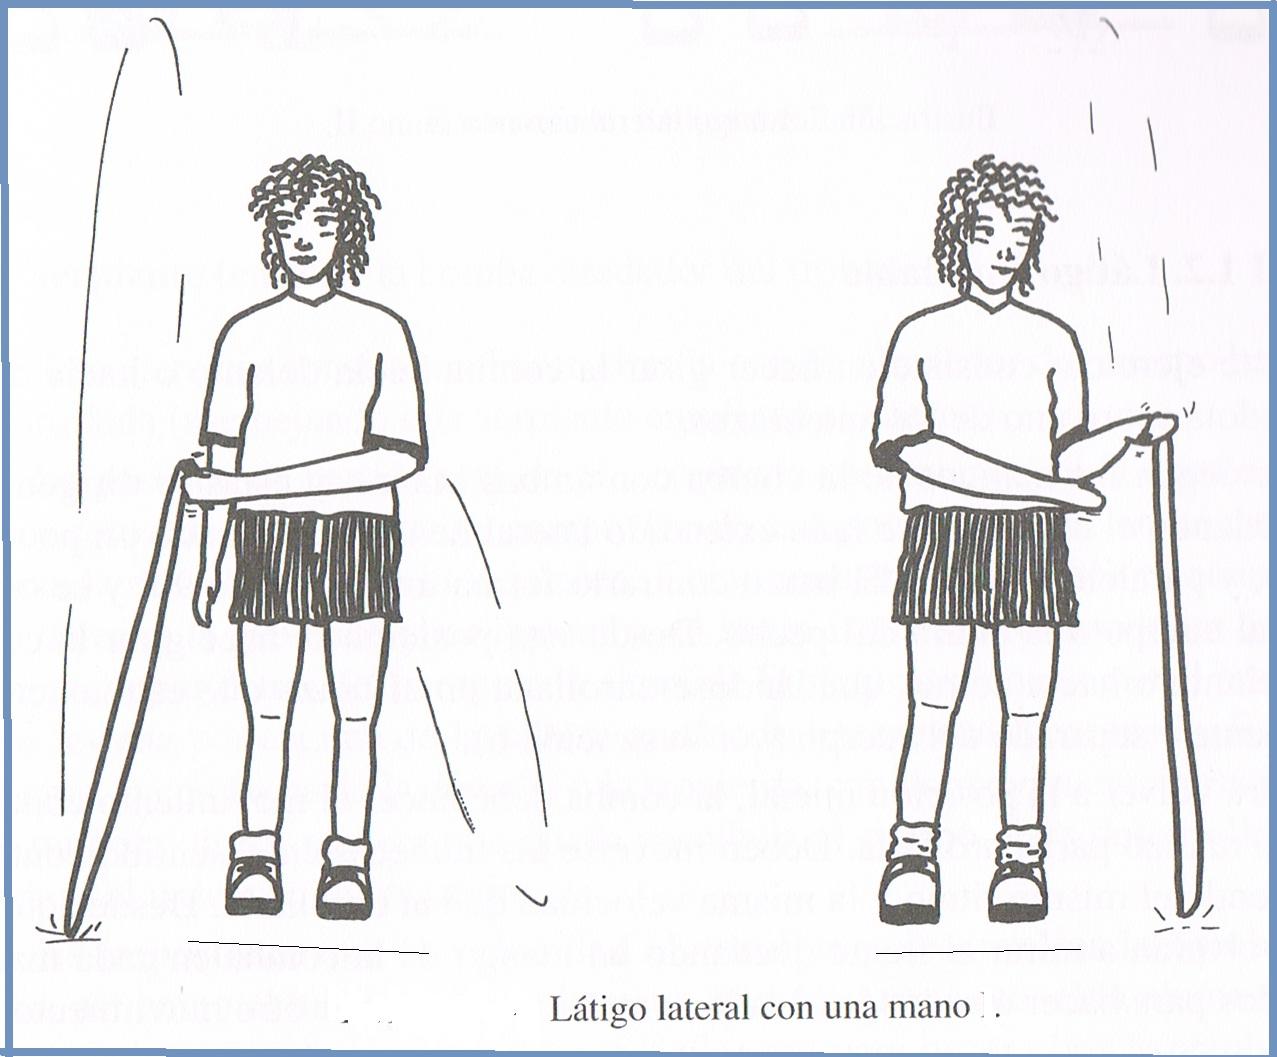 Circo Socioeducativo Del Ceip Virgen De Sacedon Salto De